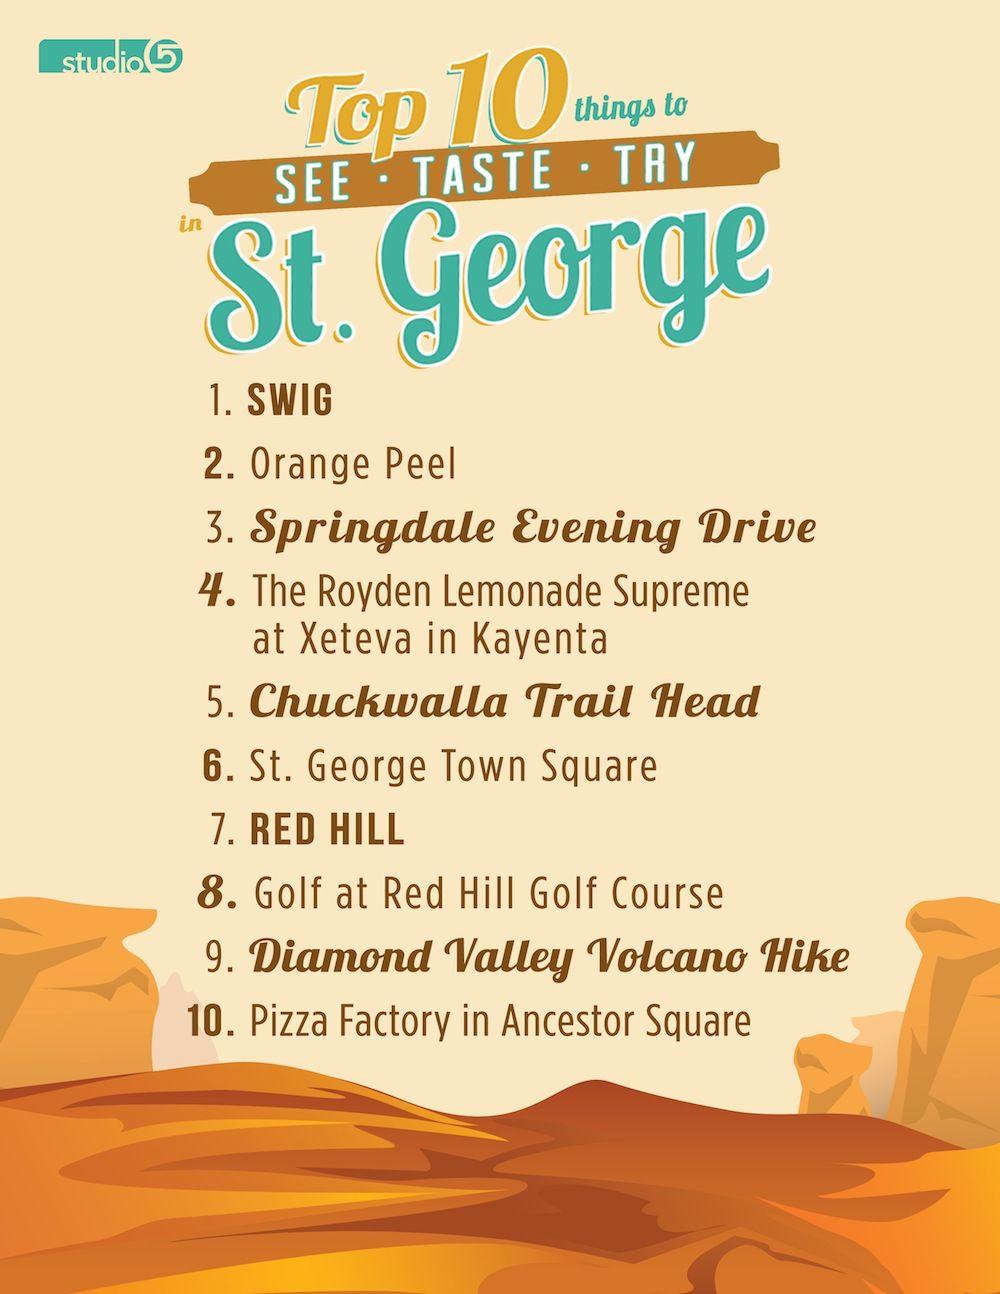 studio 5 - top 10 things to see, taste and try in st. george